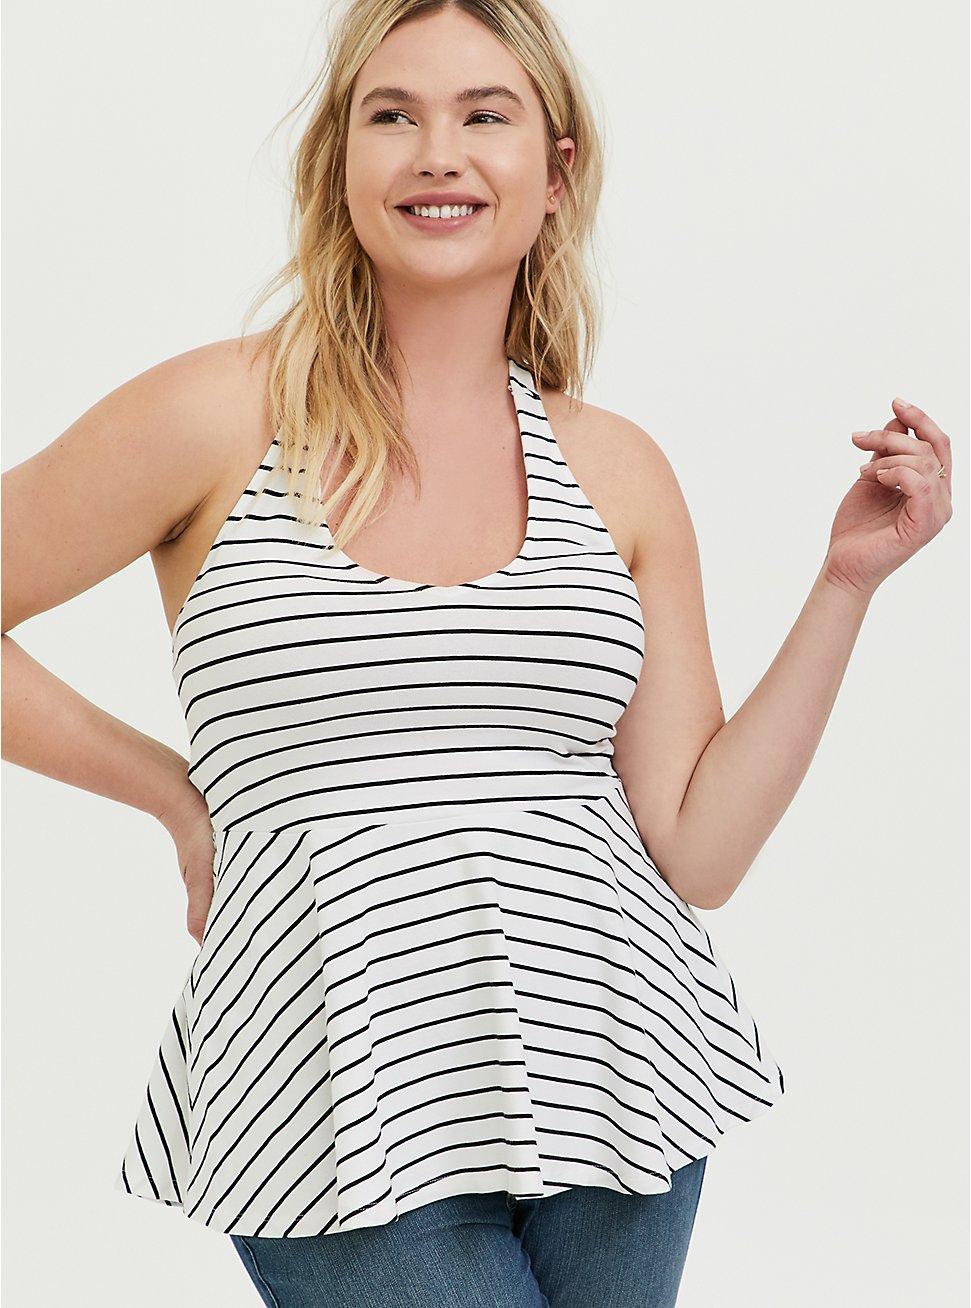 White & Black Stripe Peplum Foxy Halter Top, STRIPES, hi-res